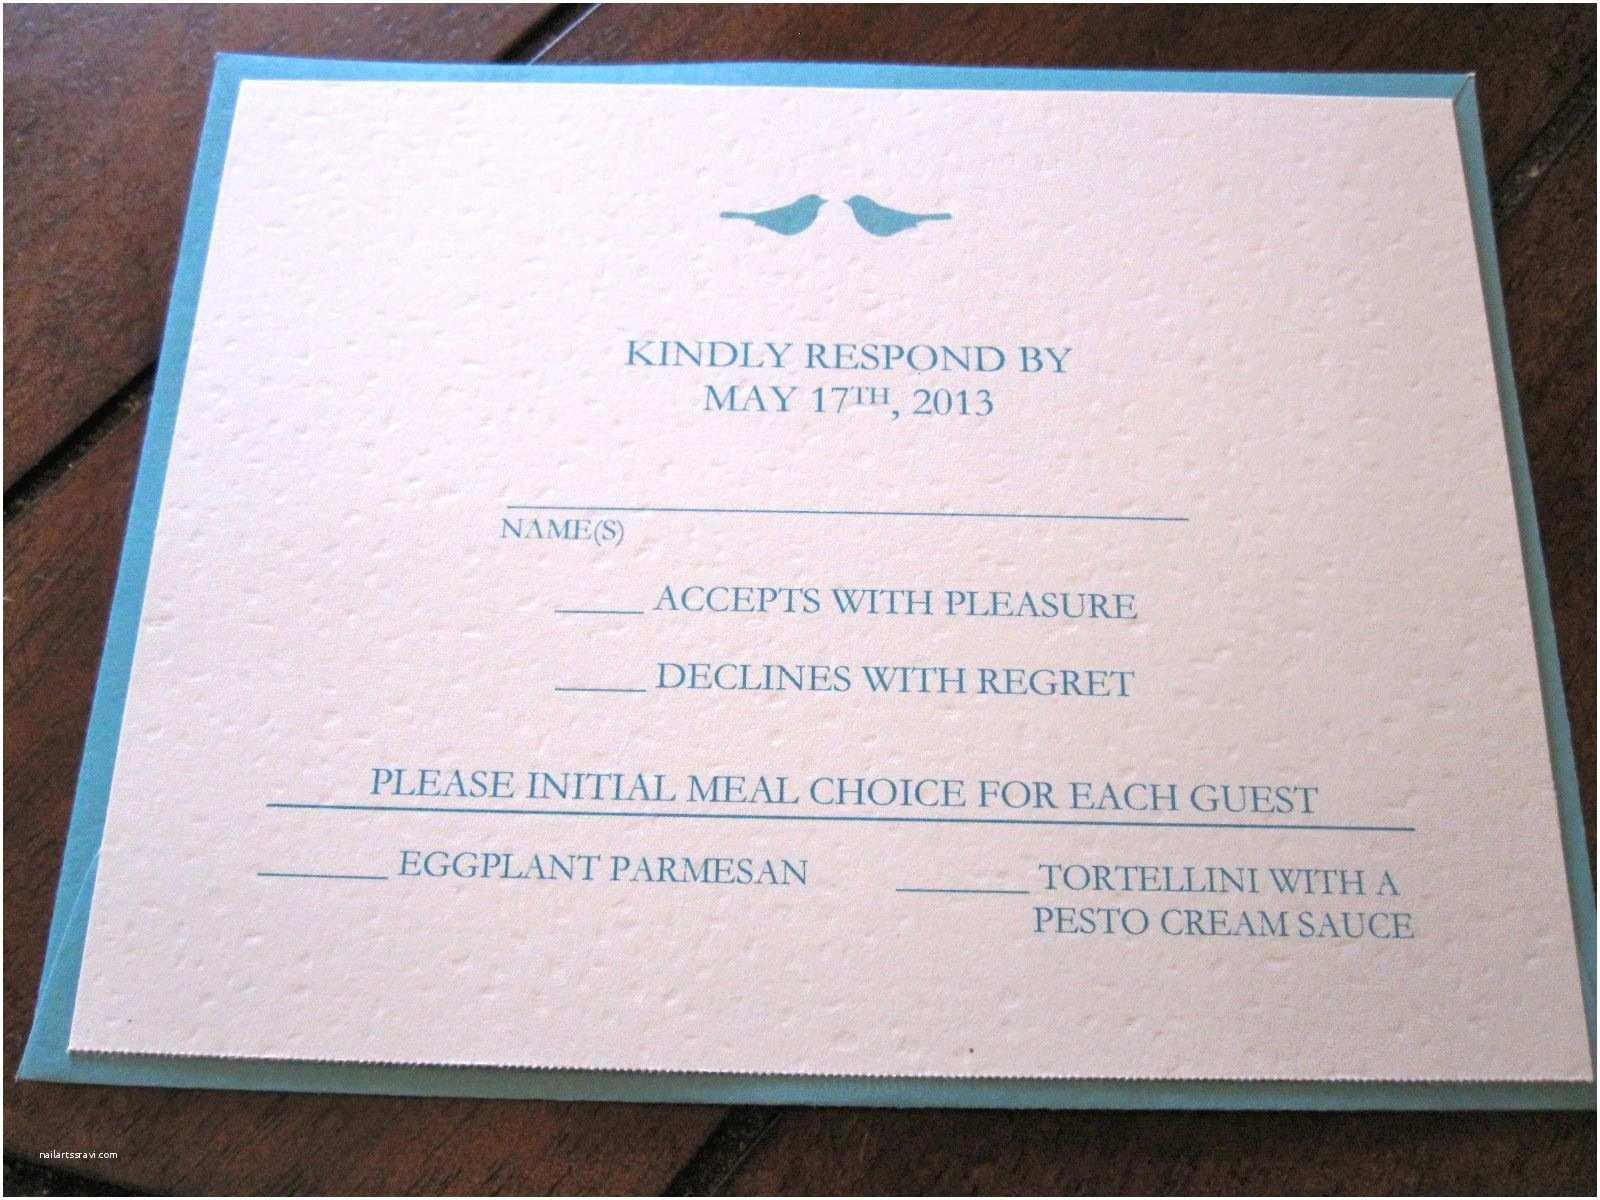 Reply to Wedding Invitation event Invitation Wedding Invitations Reply Cards Card